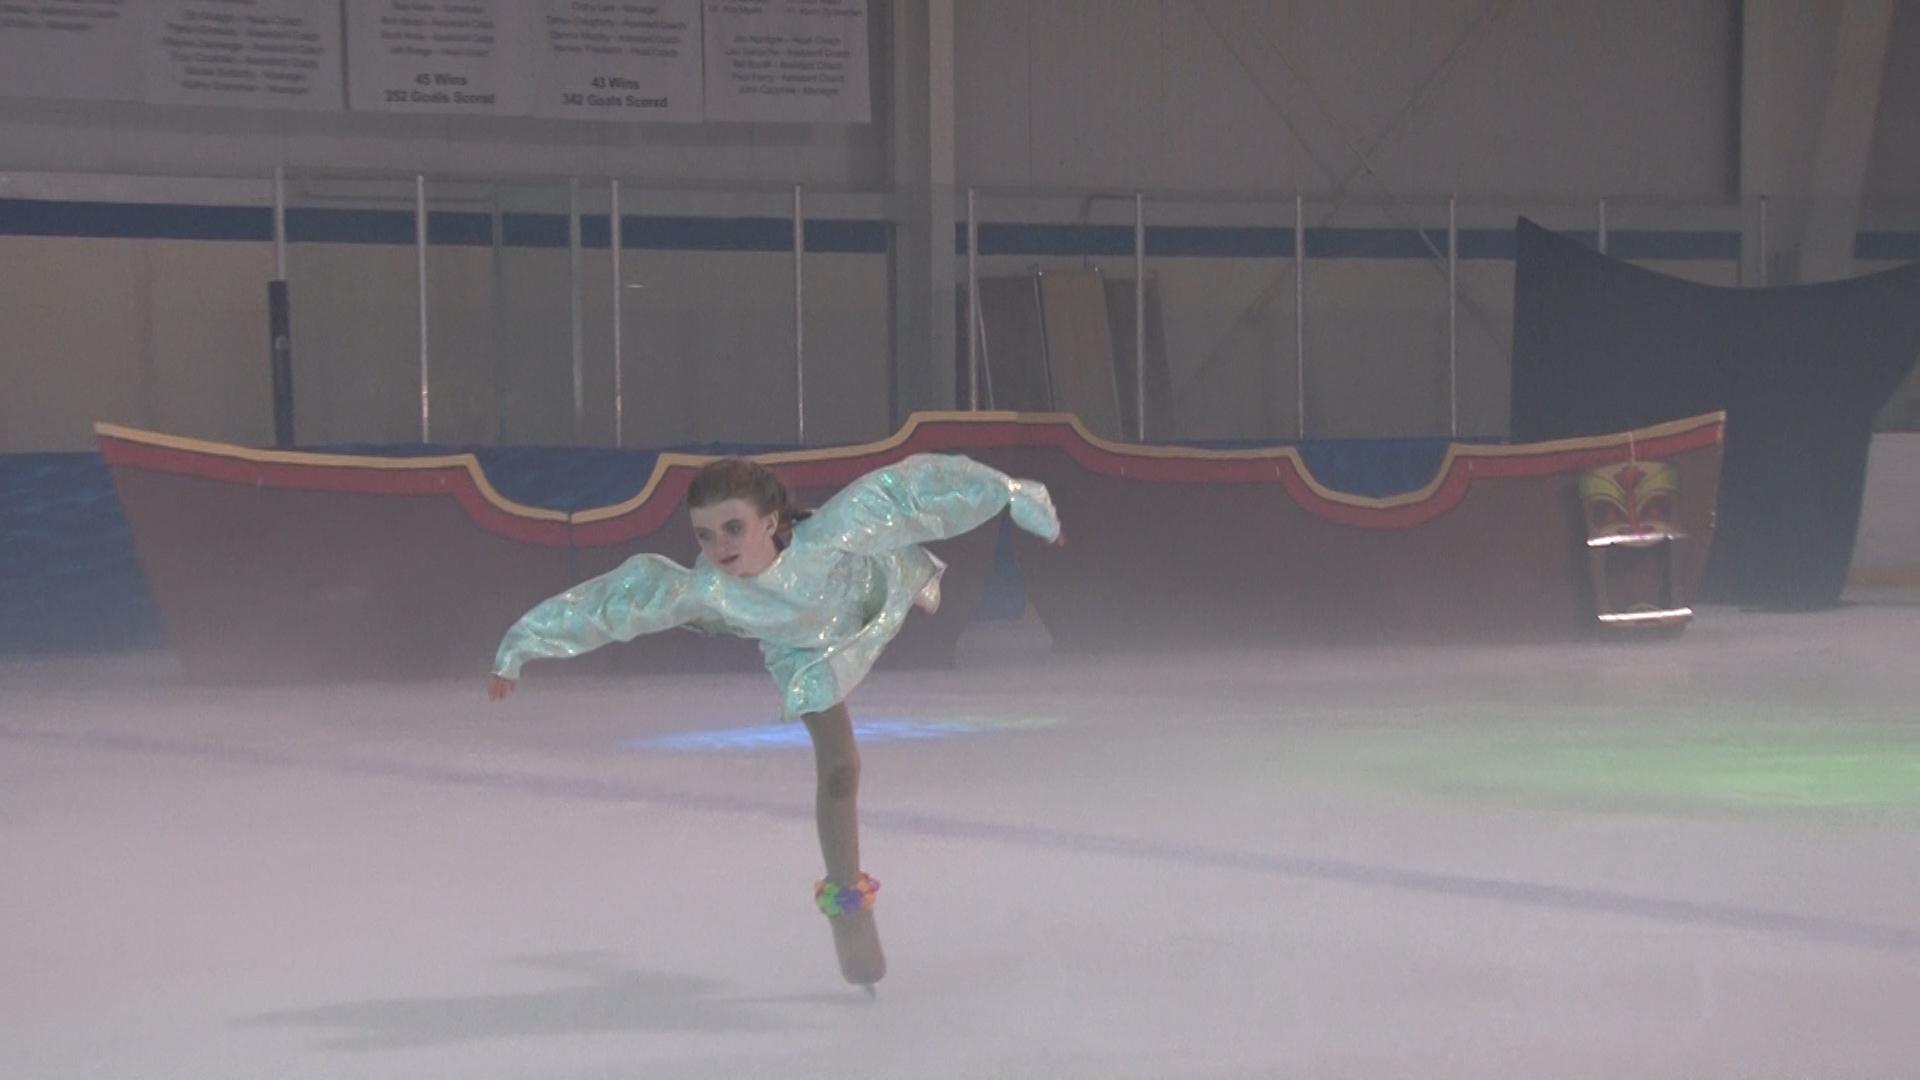 Power Play Maui Skate on Ice 071417.00_45_04_01.Still066.jpg